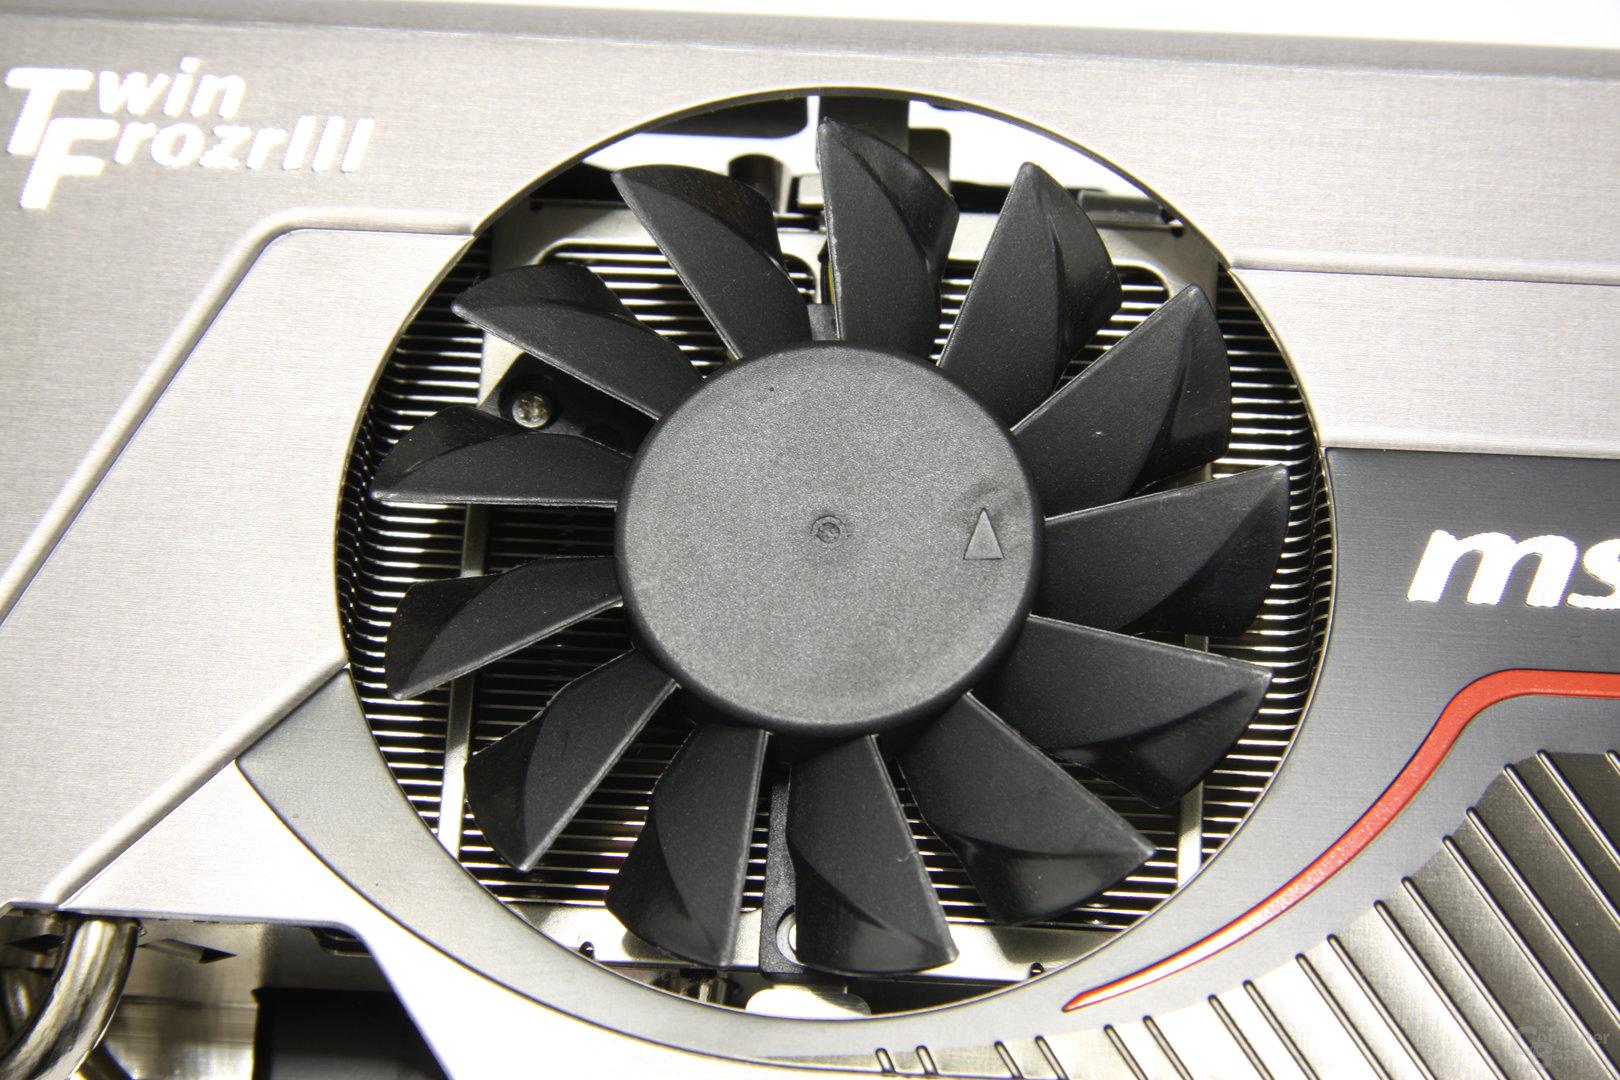 GeForce GTX 560 Ti 448 Core TFIII PE OC Lüfter